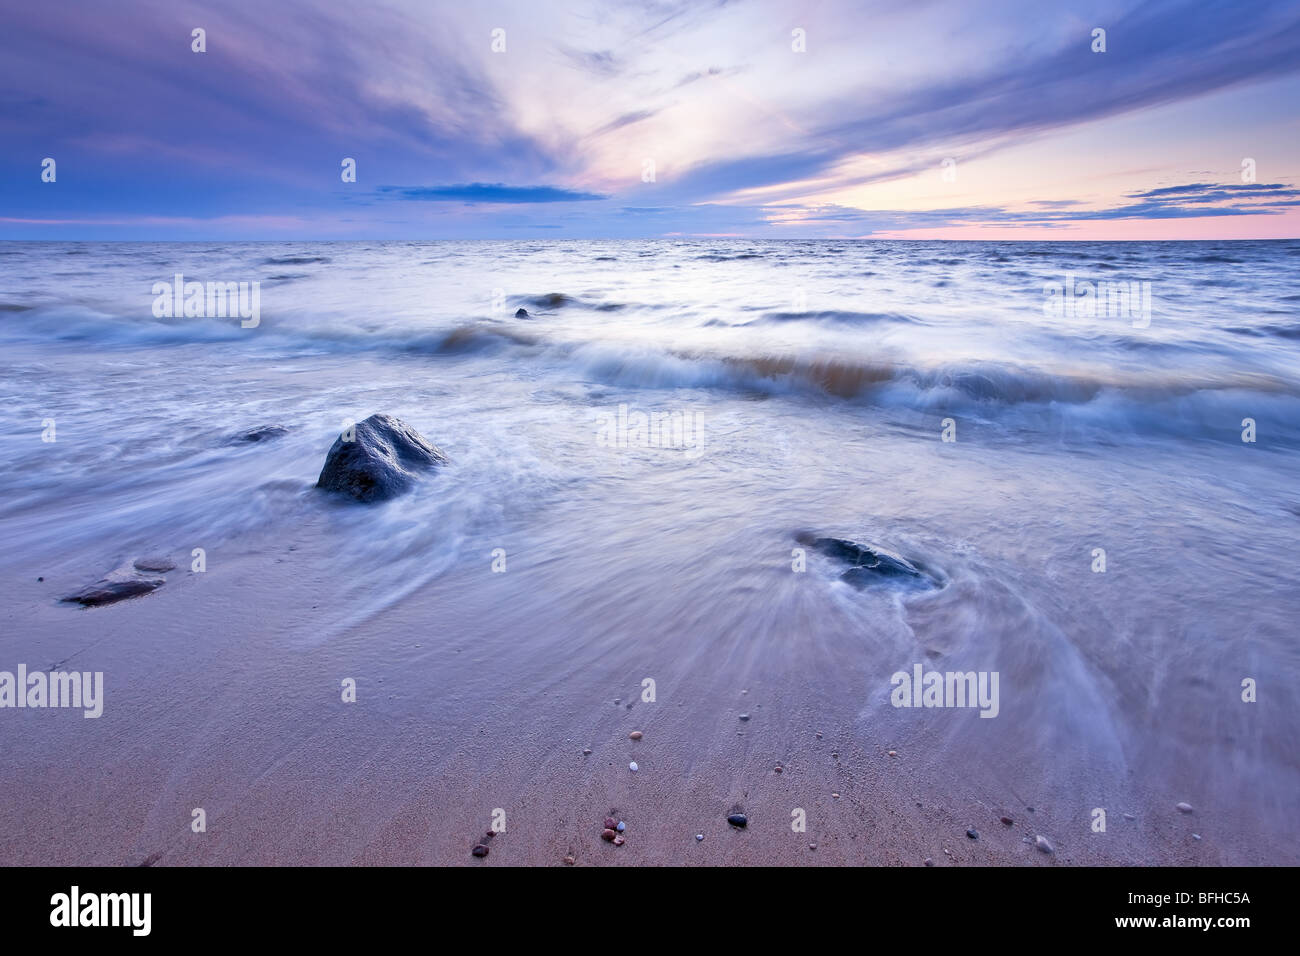 El Lago Winnipeg al anochecer. Lester Playa, Manitoba, Canadá. Imagen De Stock